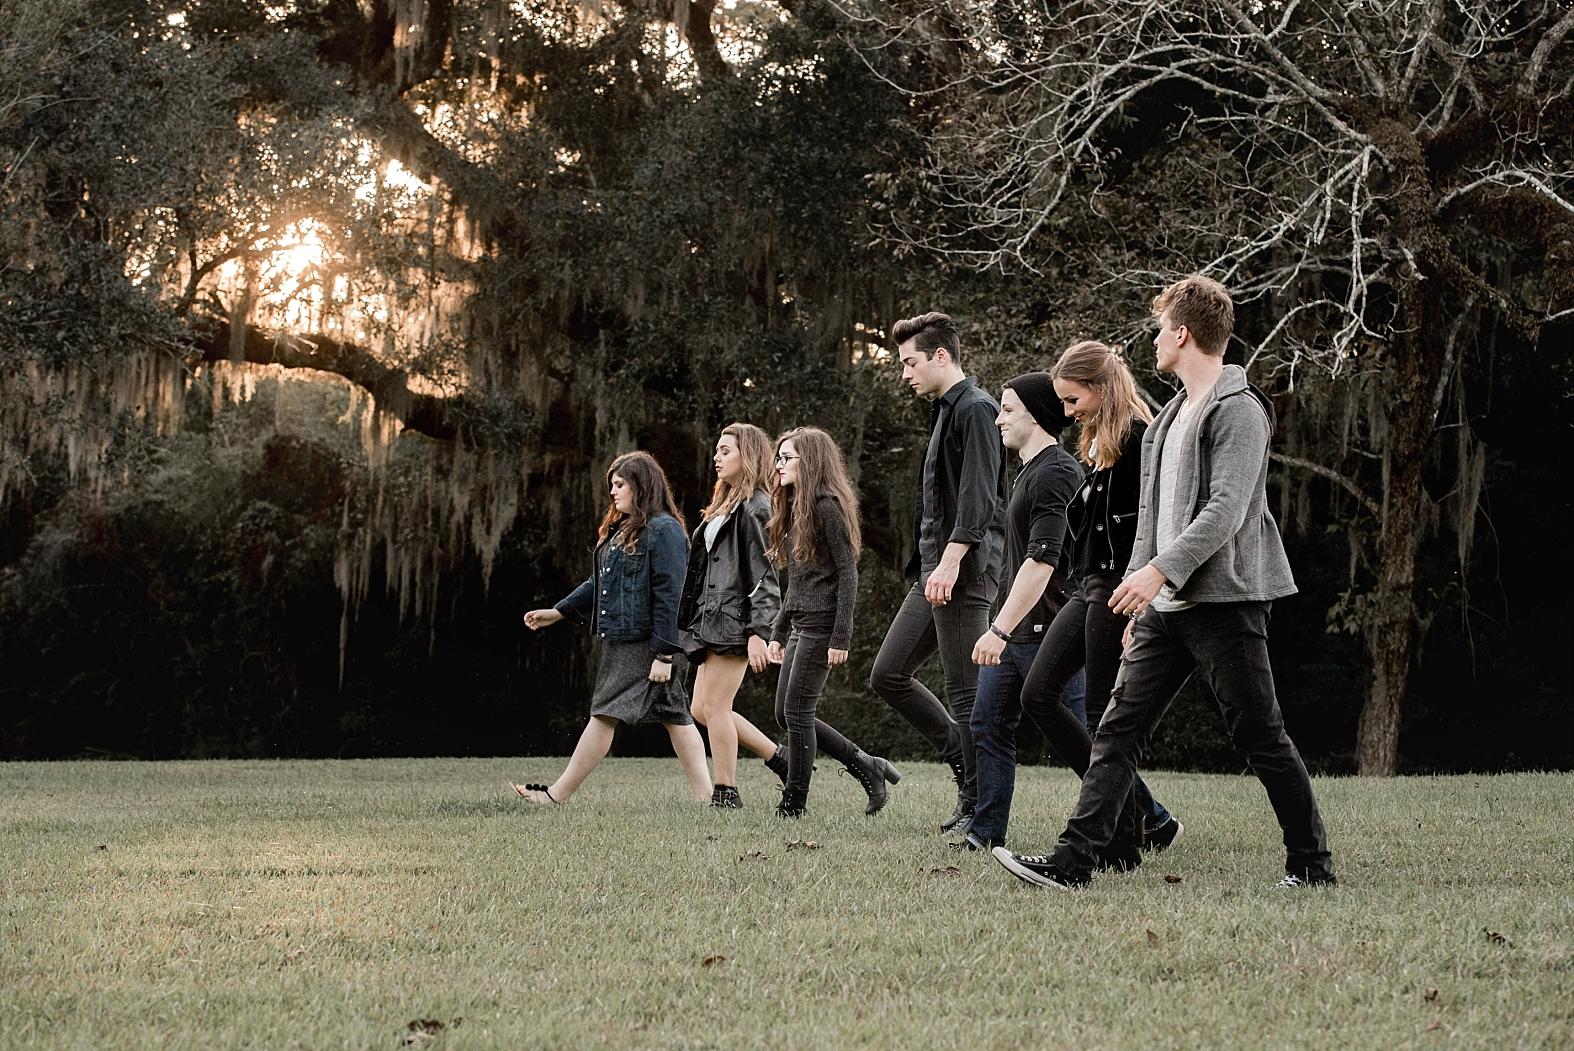 Teens in a Vampire Movie Themed Photo Shoot